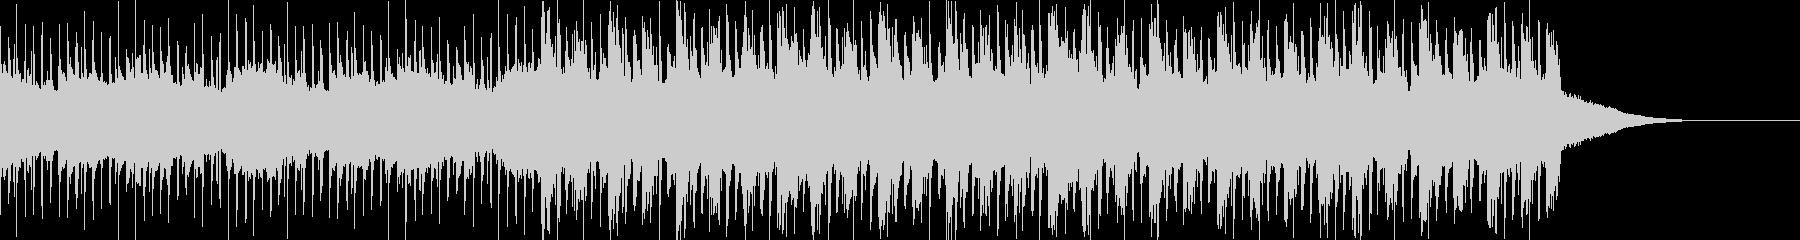 Pf「自慢」和風現代ジャズの未再生の波形